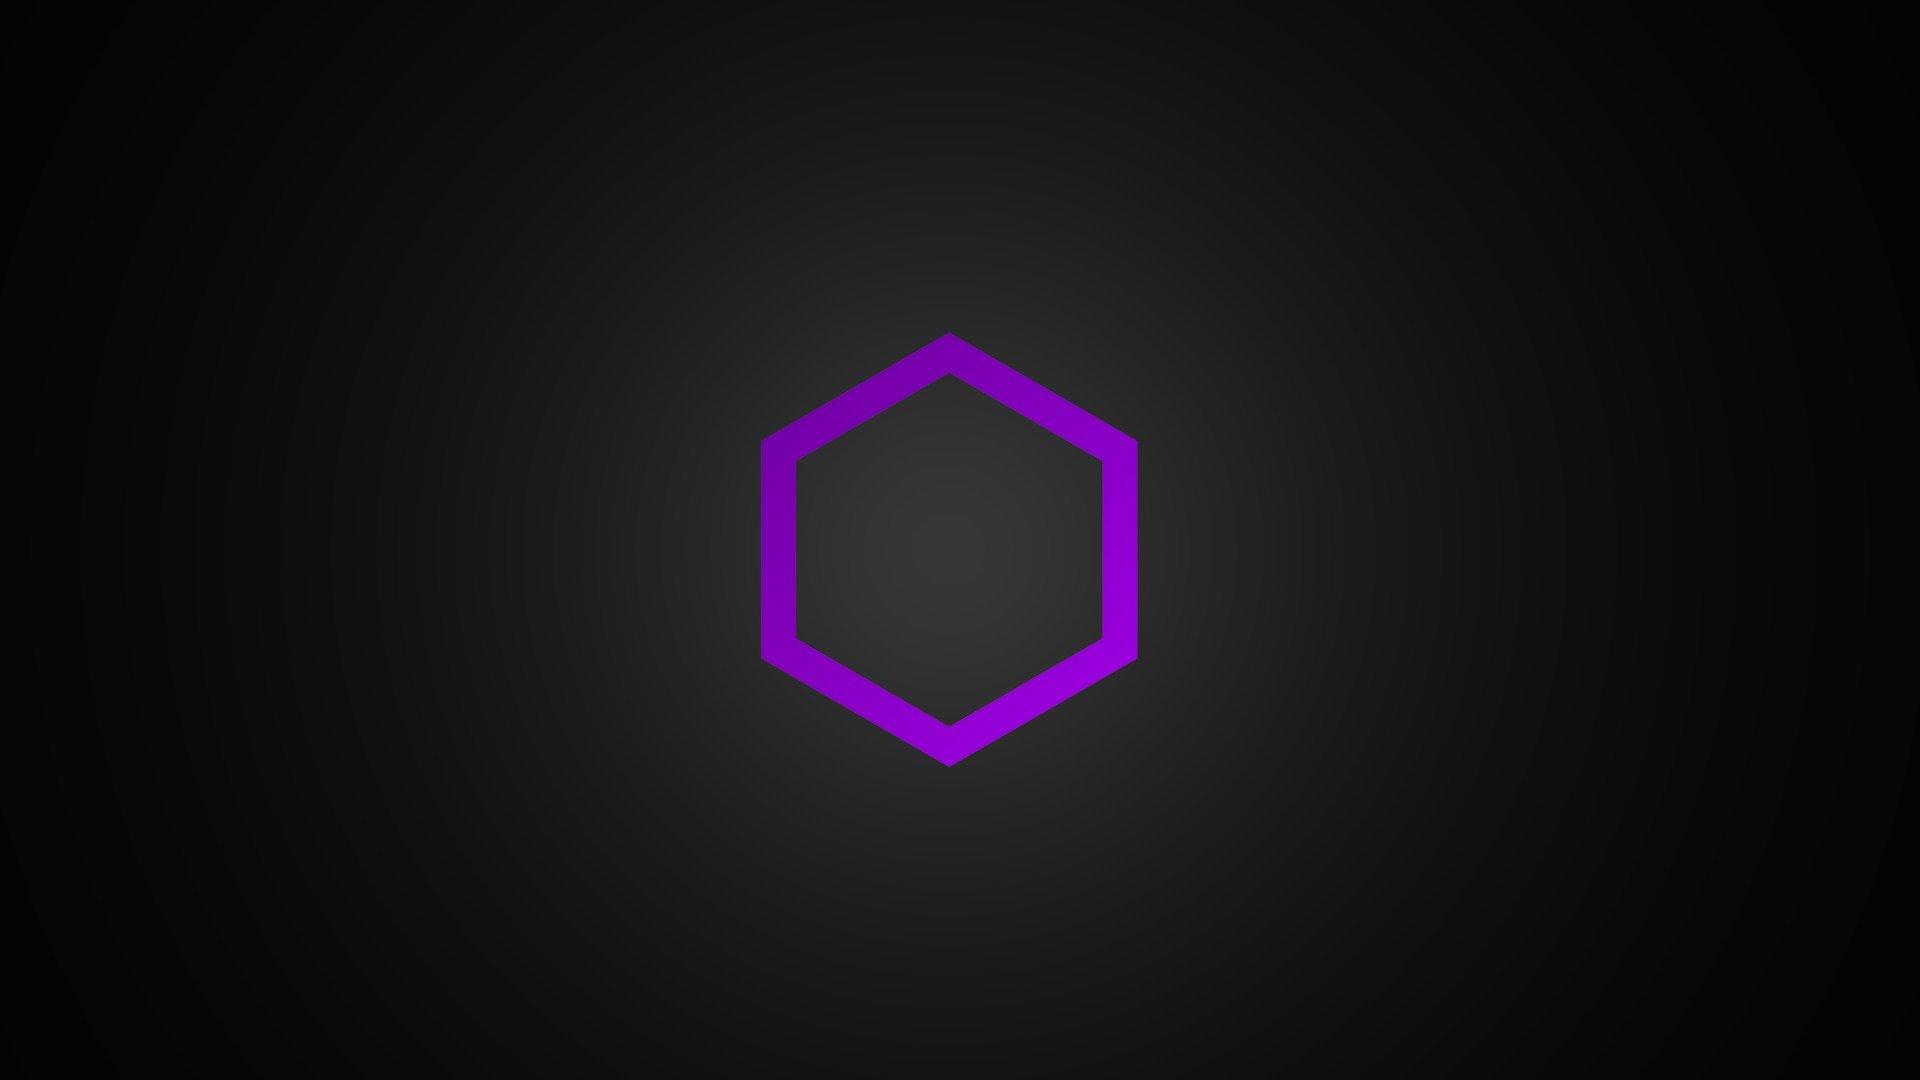 purple Minimalism Hexagon HD Wallpapers Desktop and Mobile 1920x1080